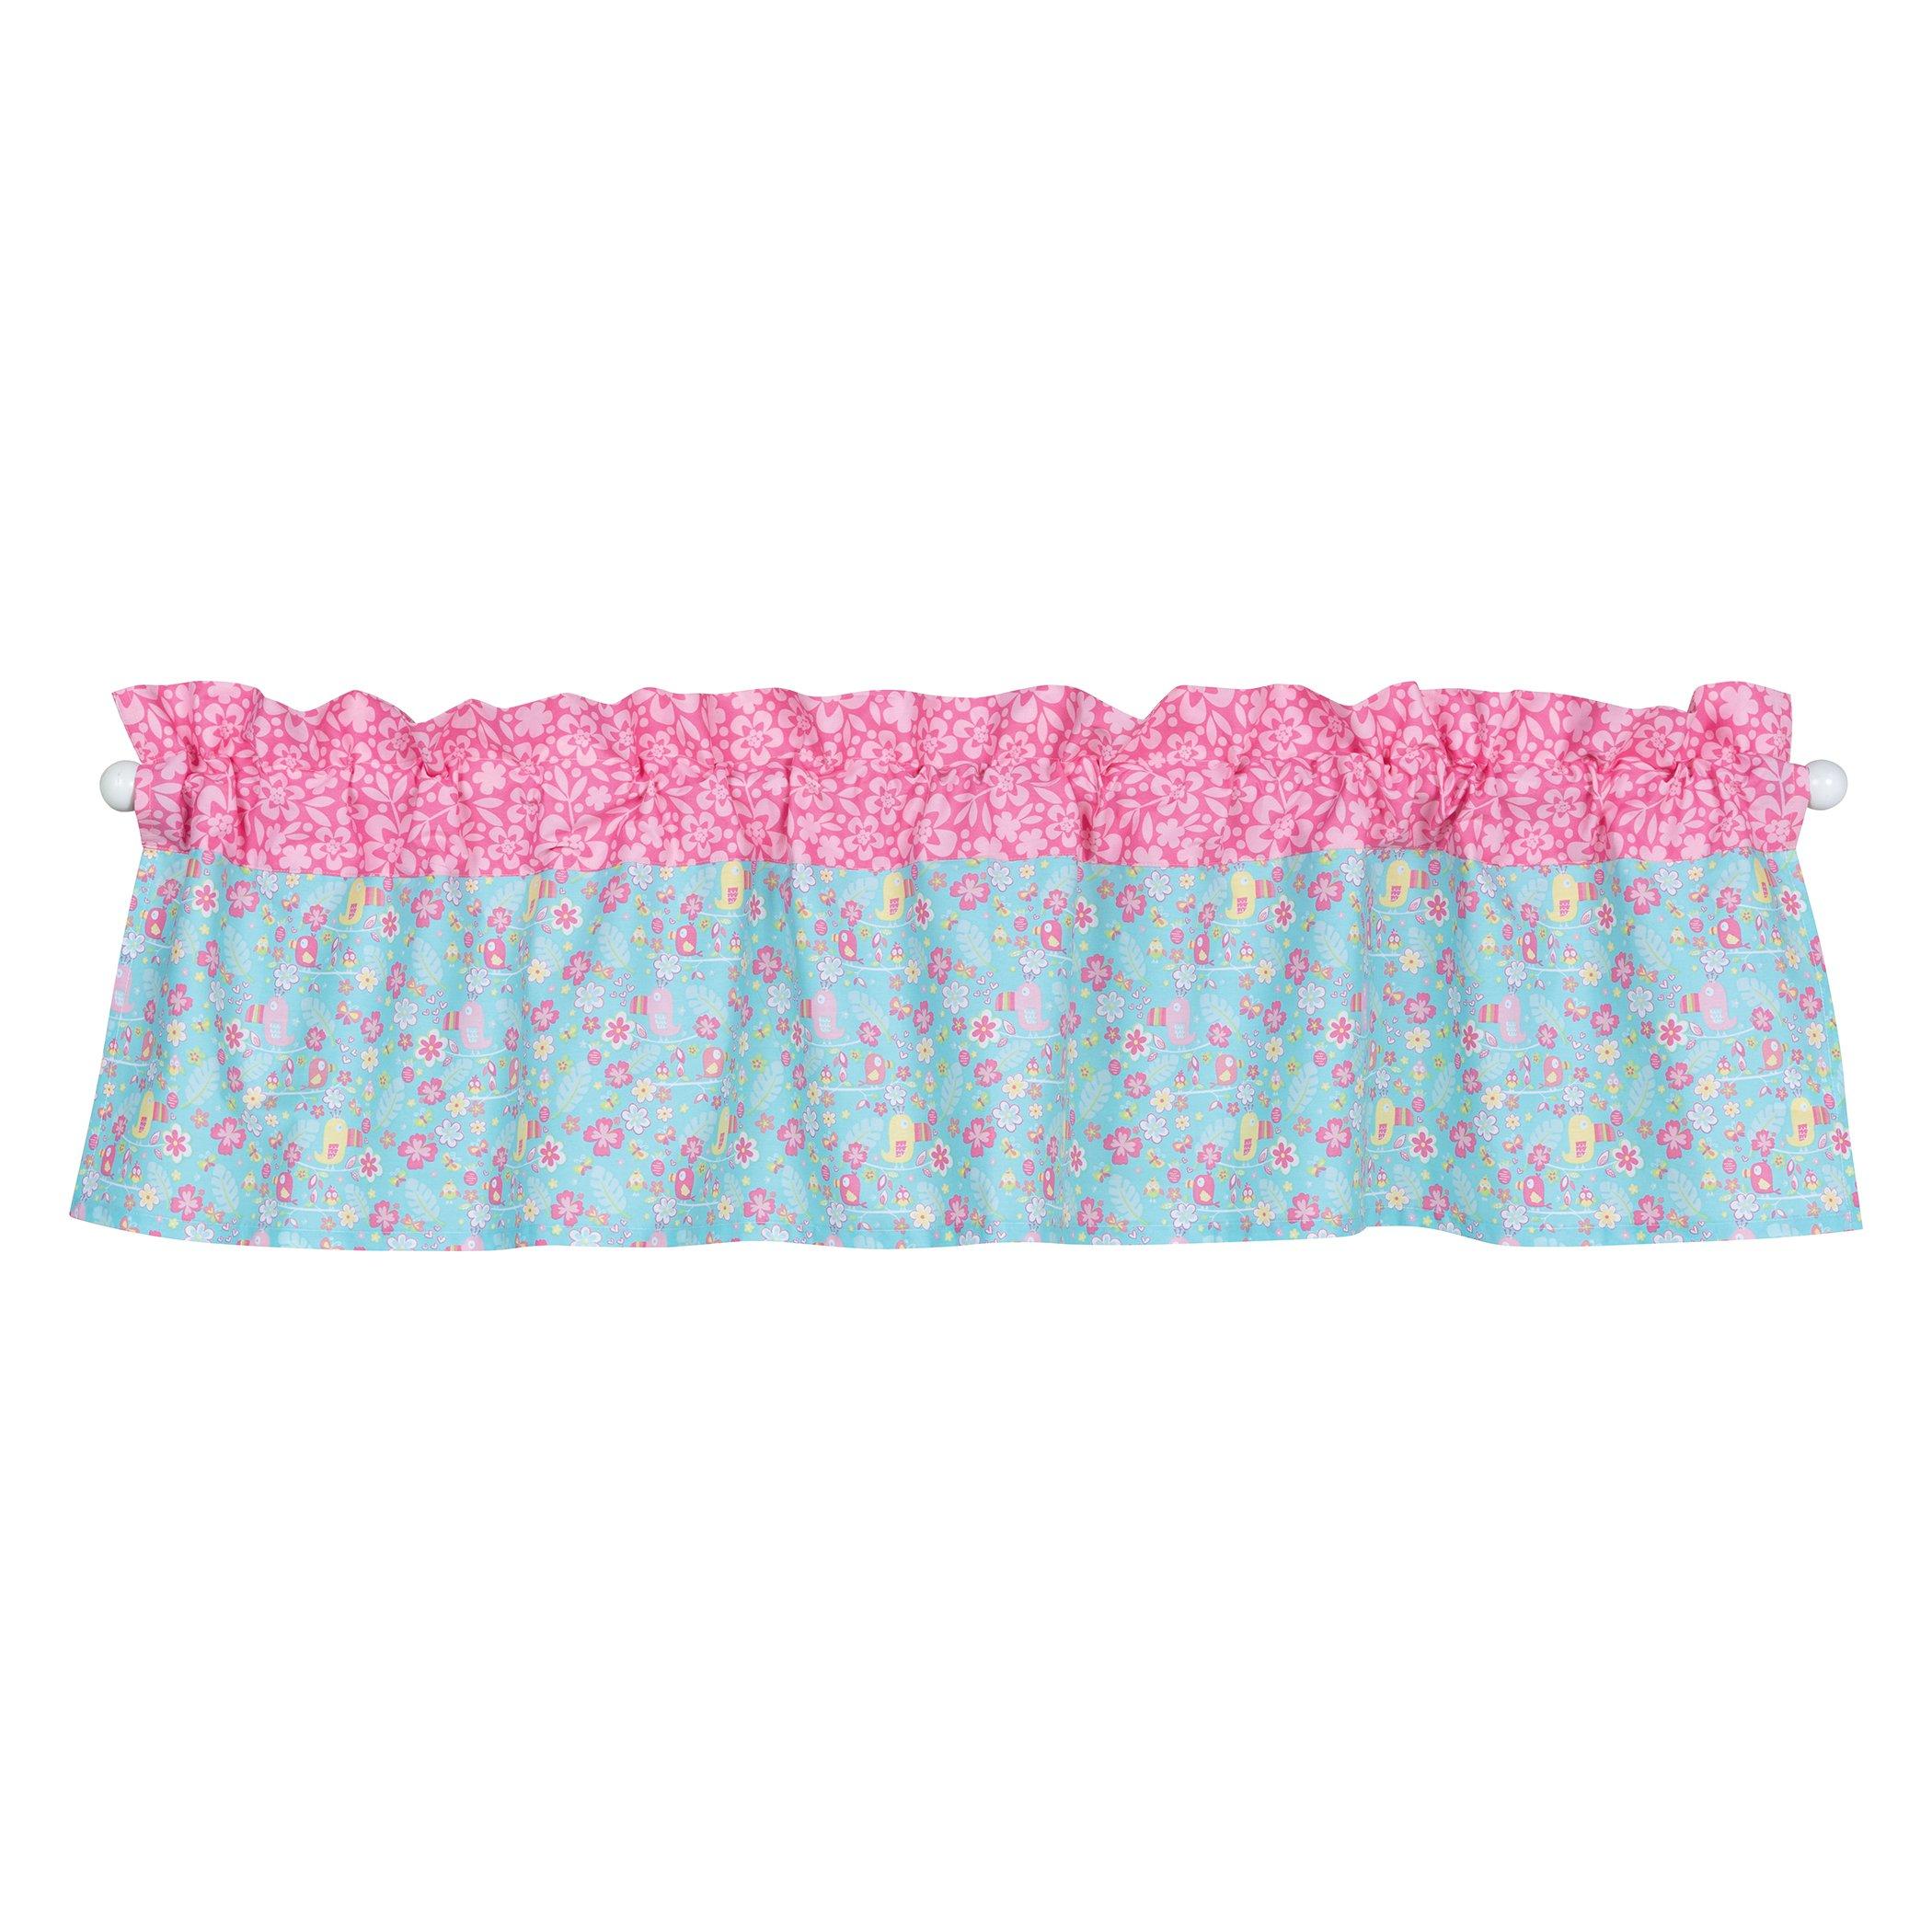 Trend Lab Tropical Tweets Window Valance, Pink